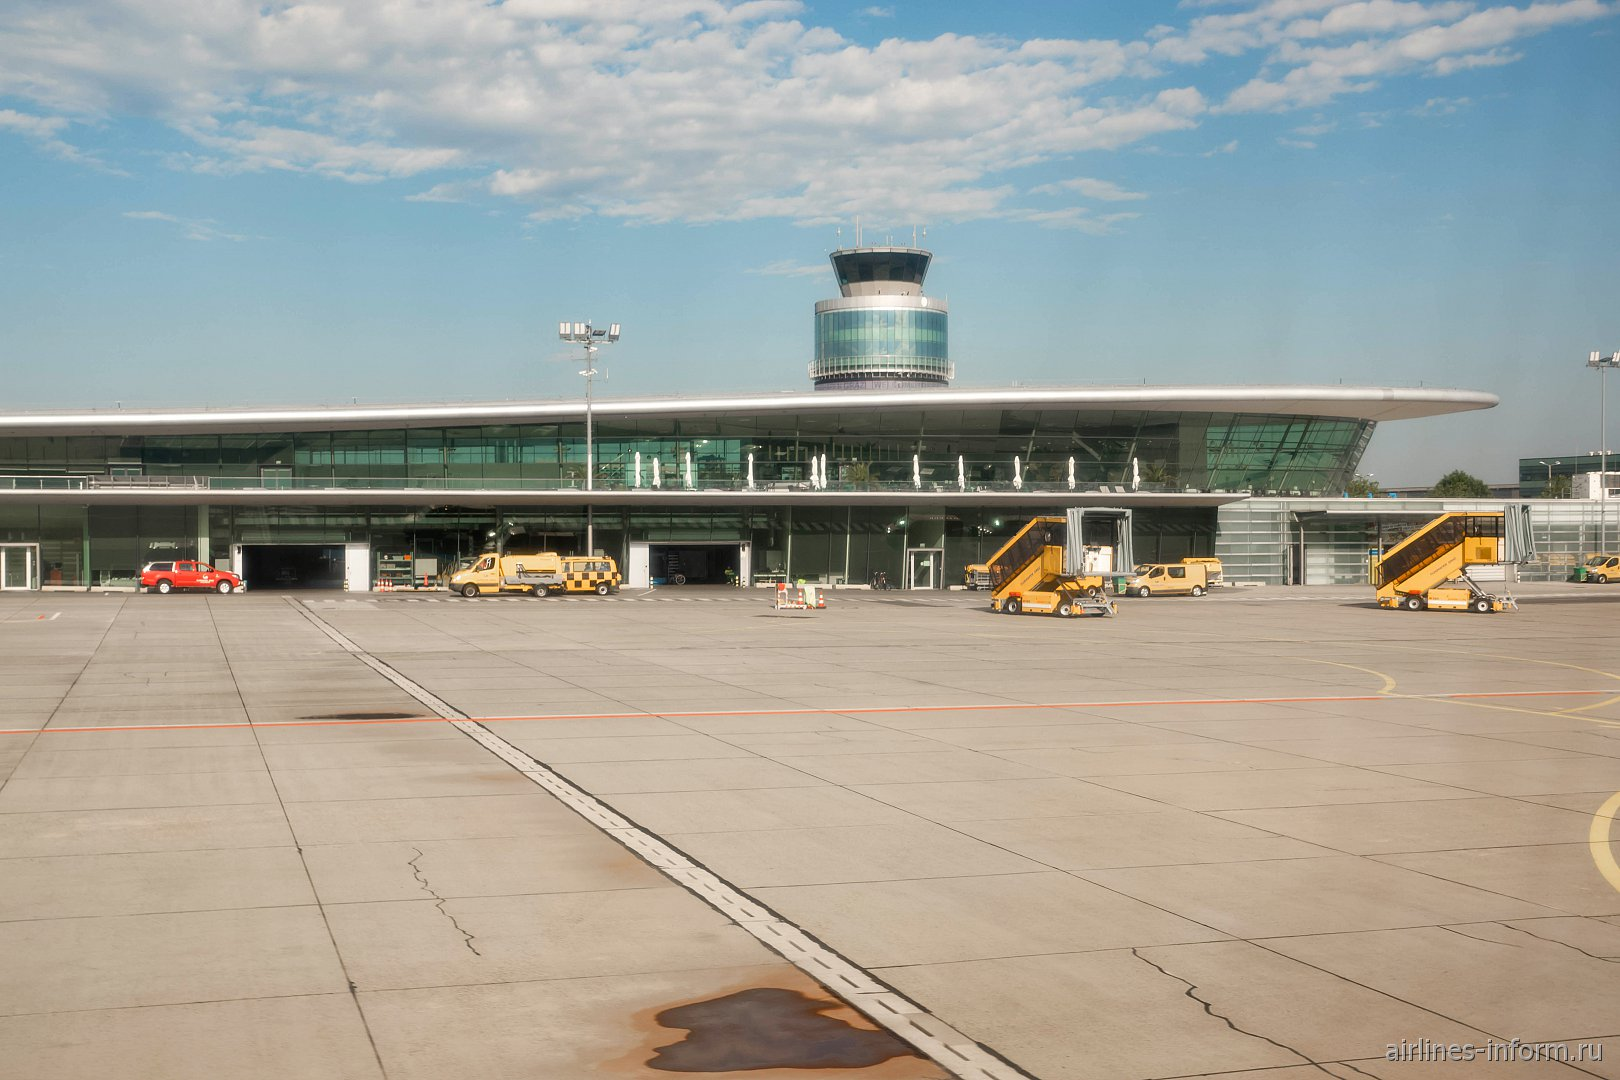 Вид с перрона на пассажирский терминал аэропорта Грац Талерхоф